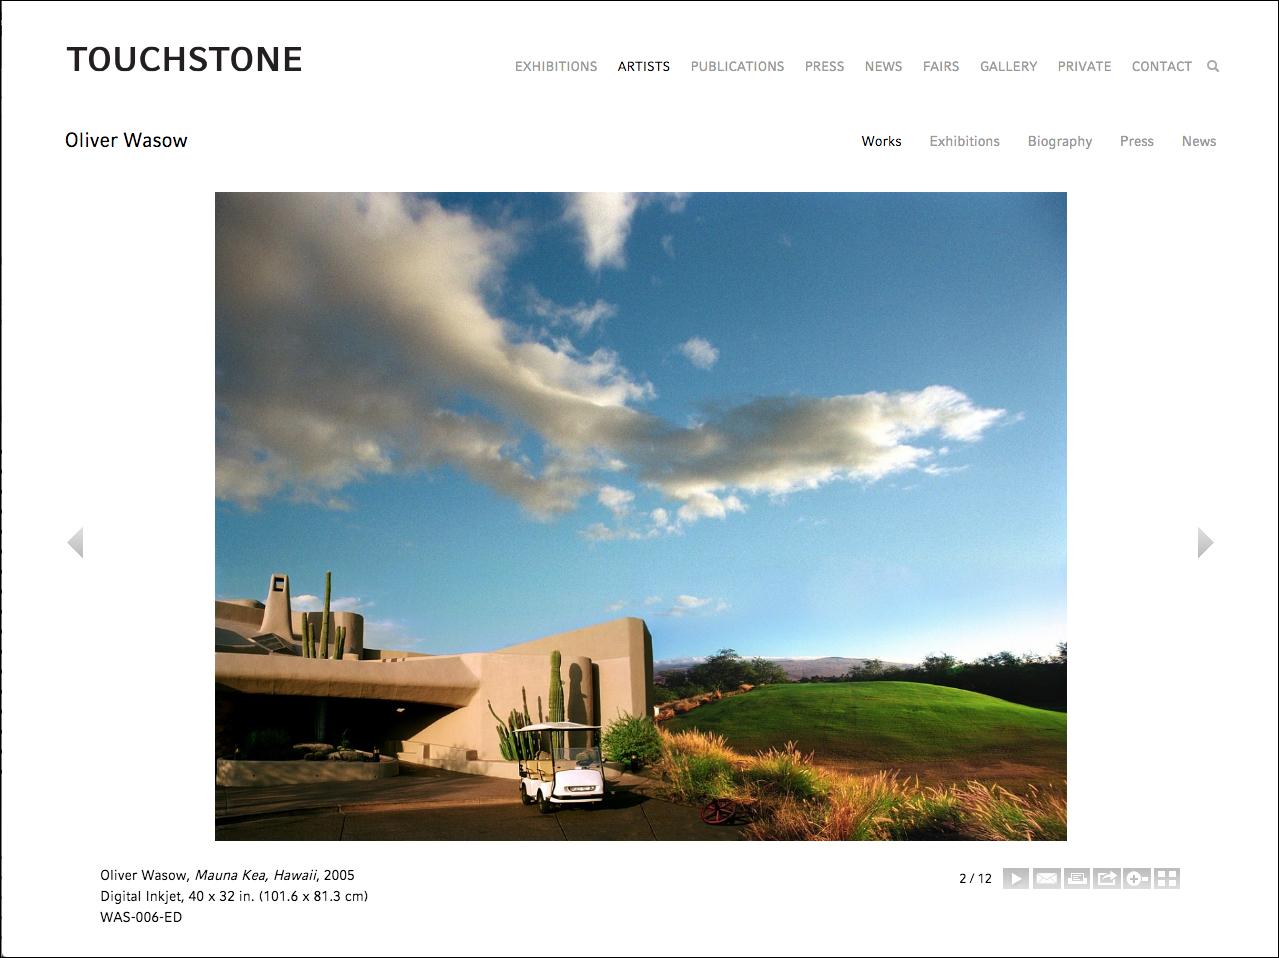 touchstone_wasow